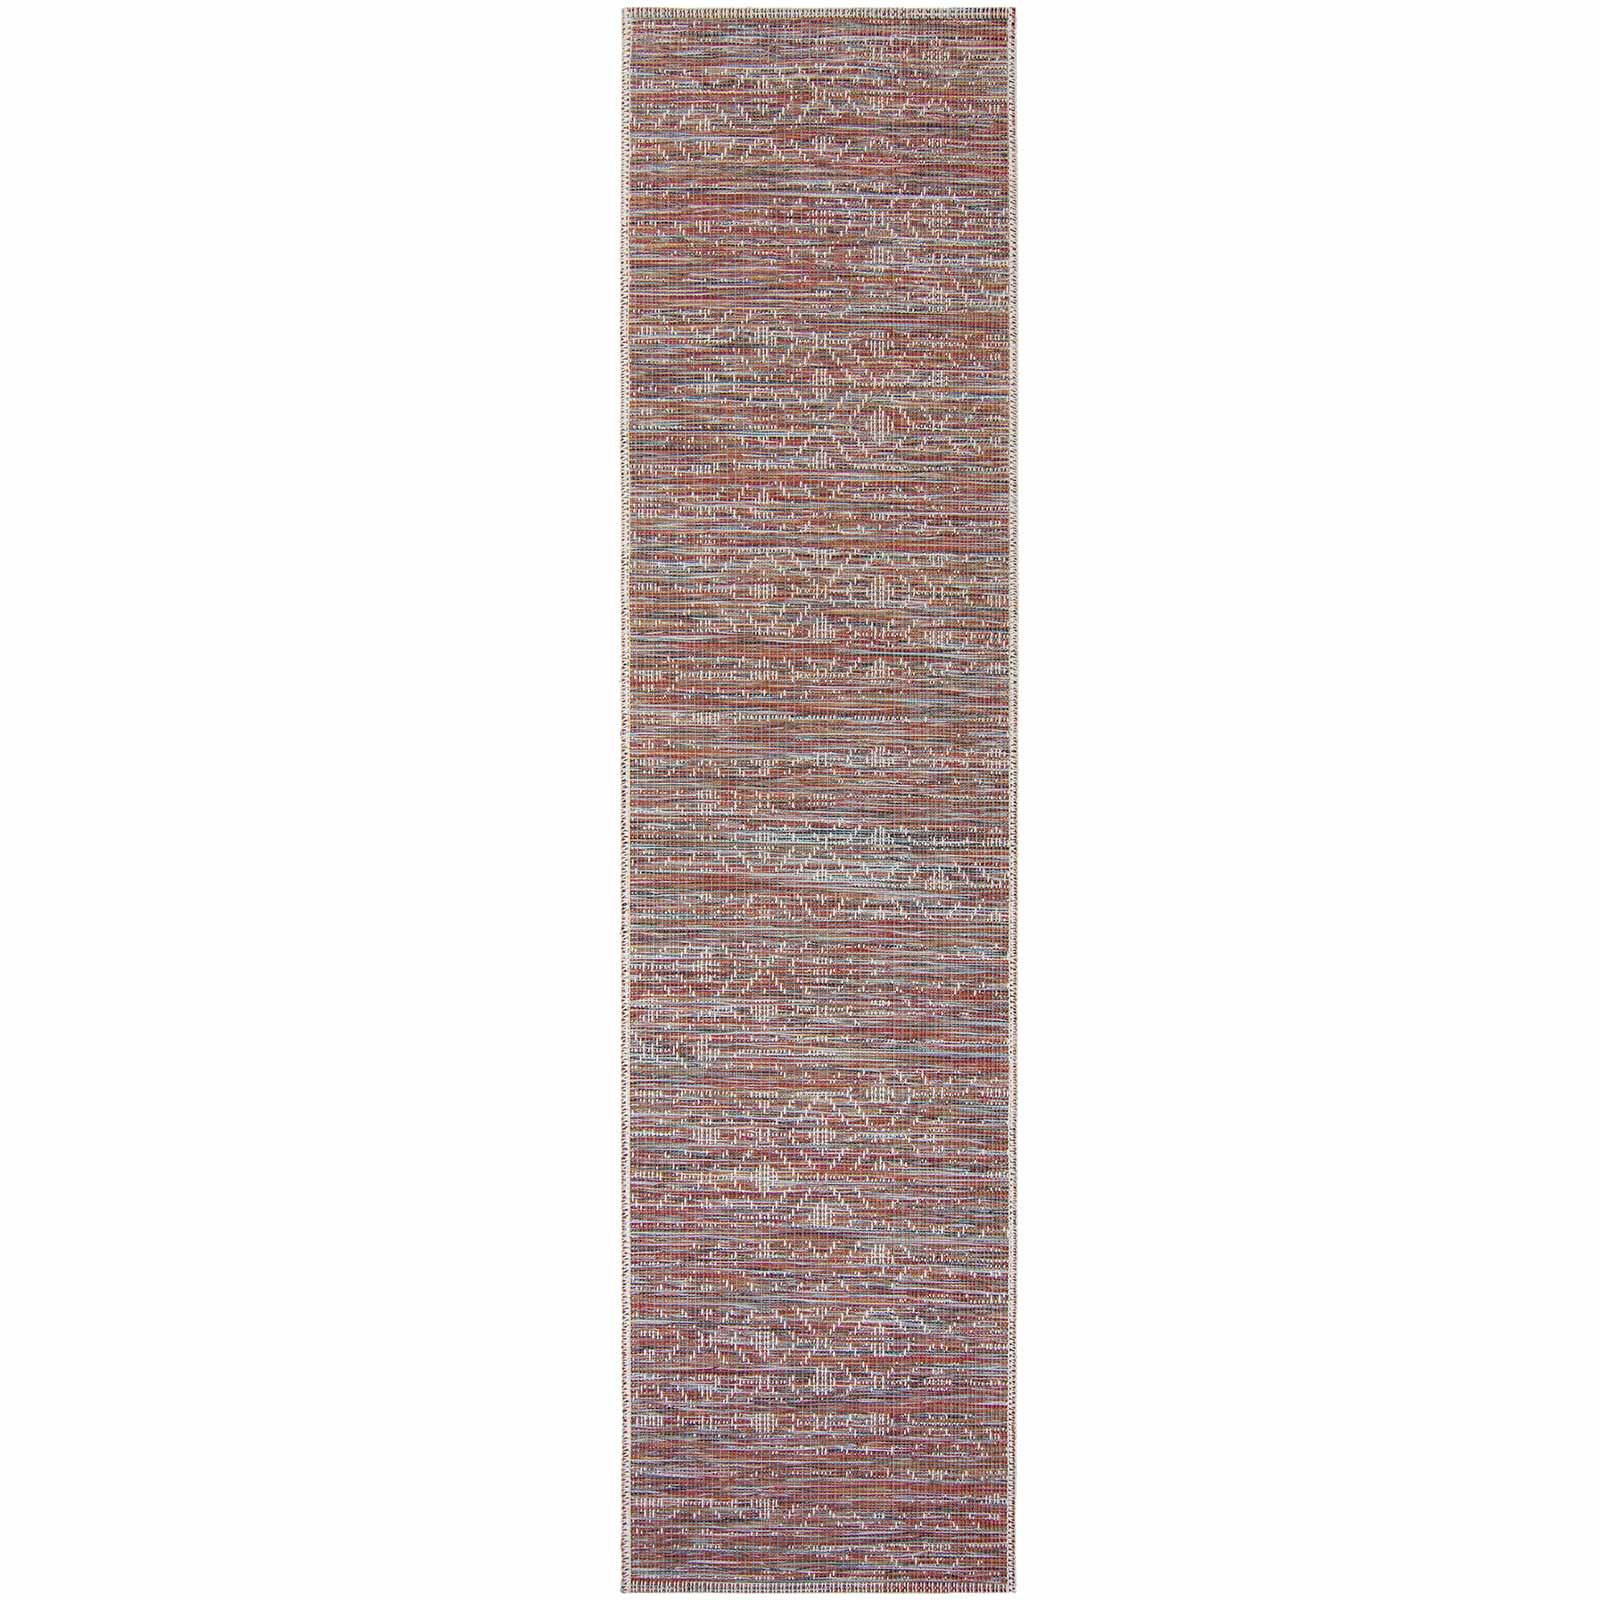 Andessi Teppiche Larino Sunset Terracotta MIX 4